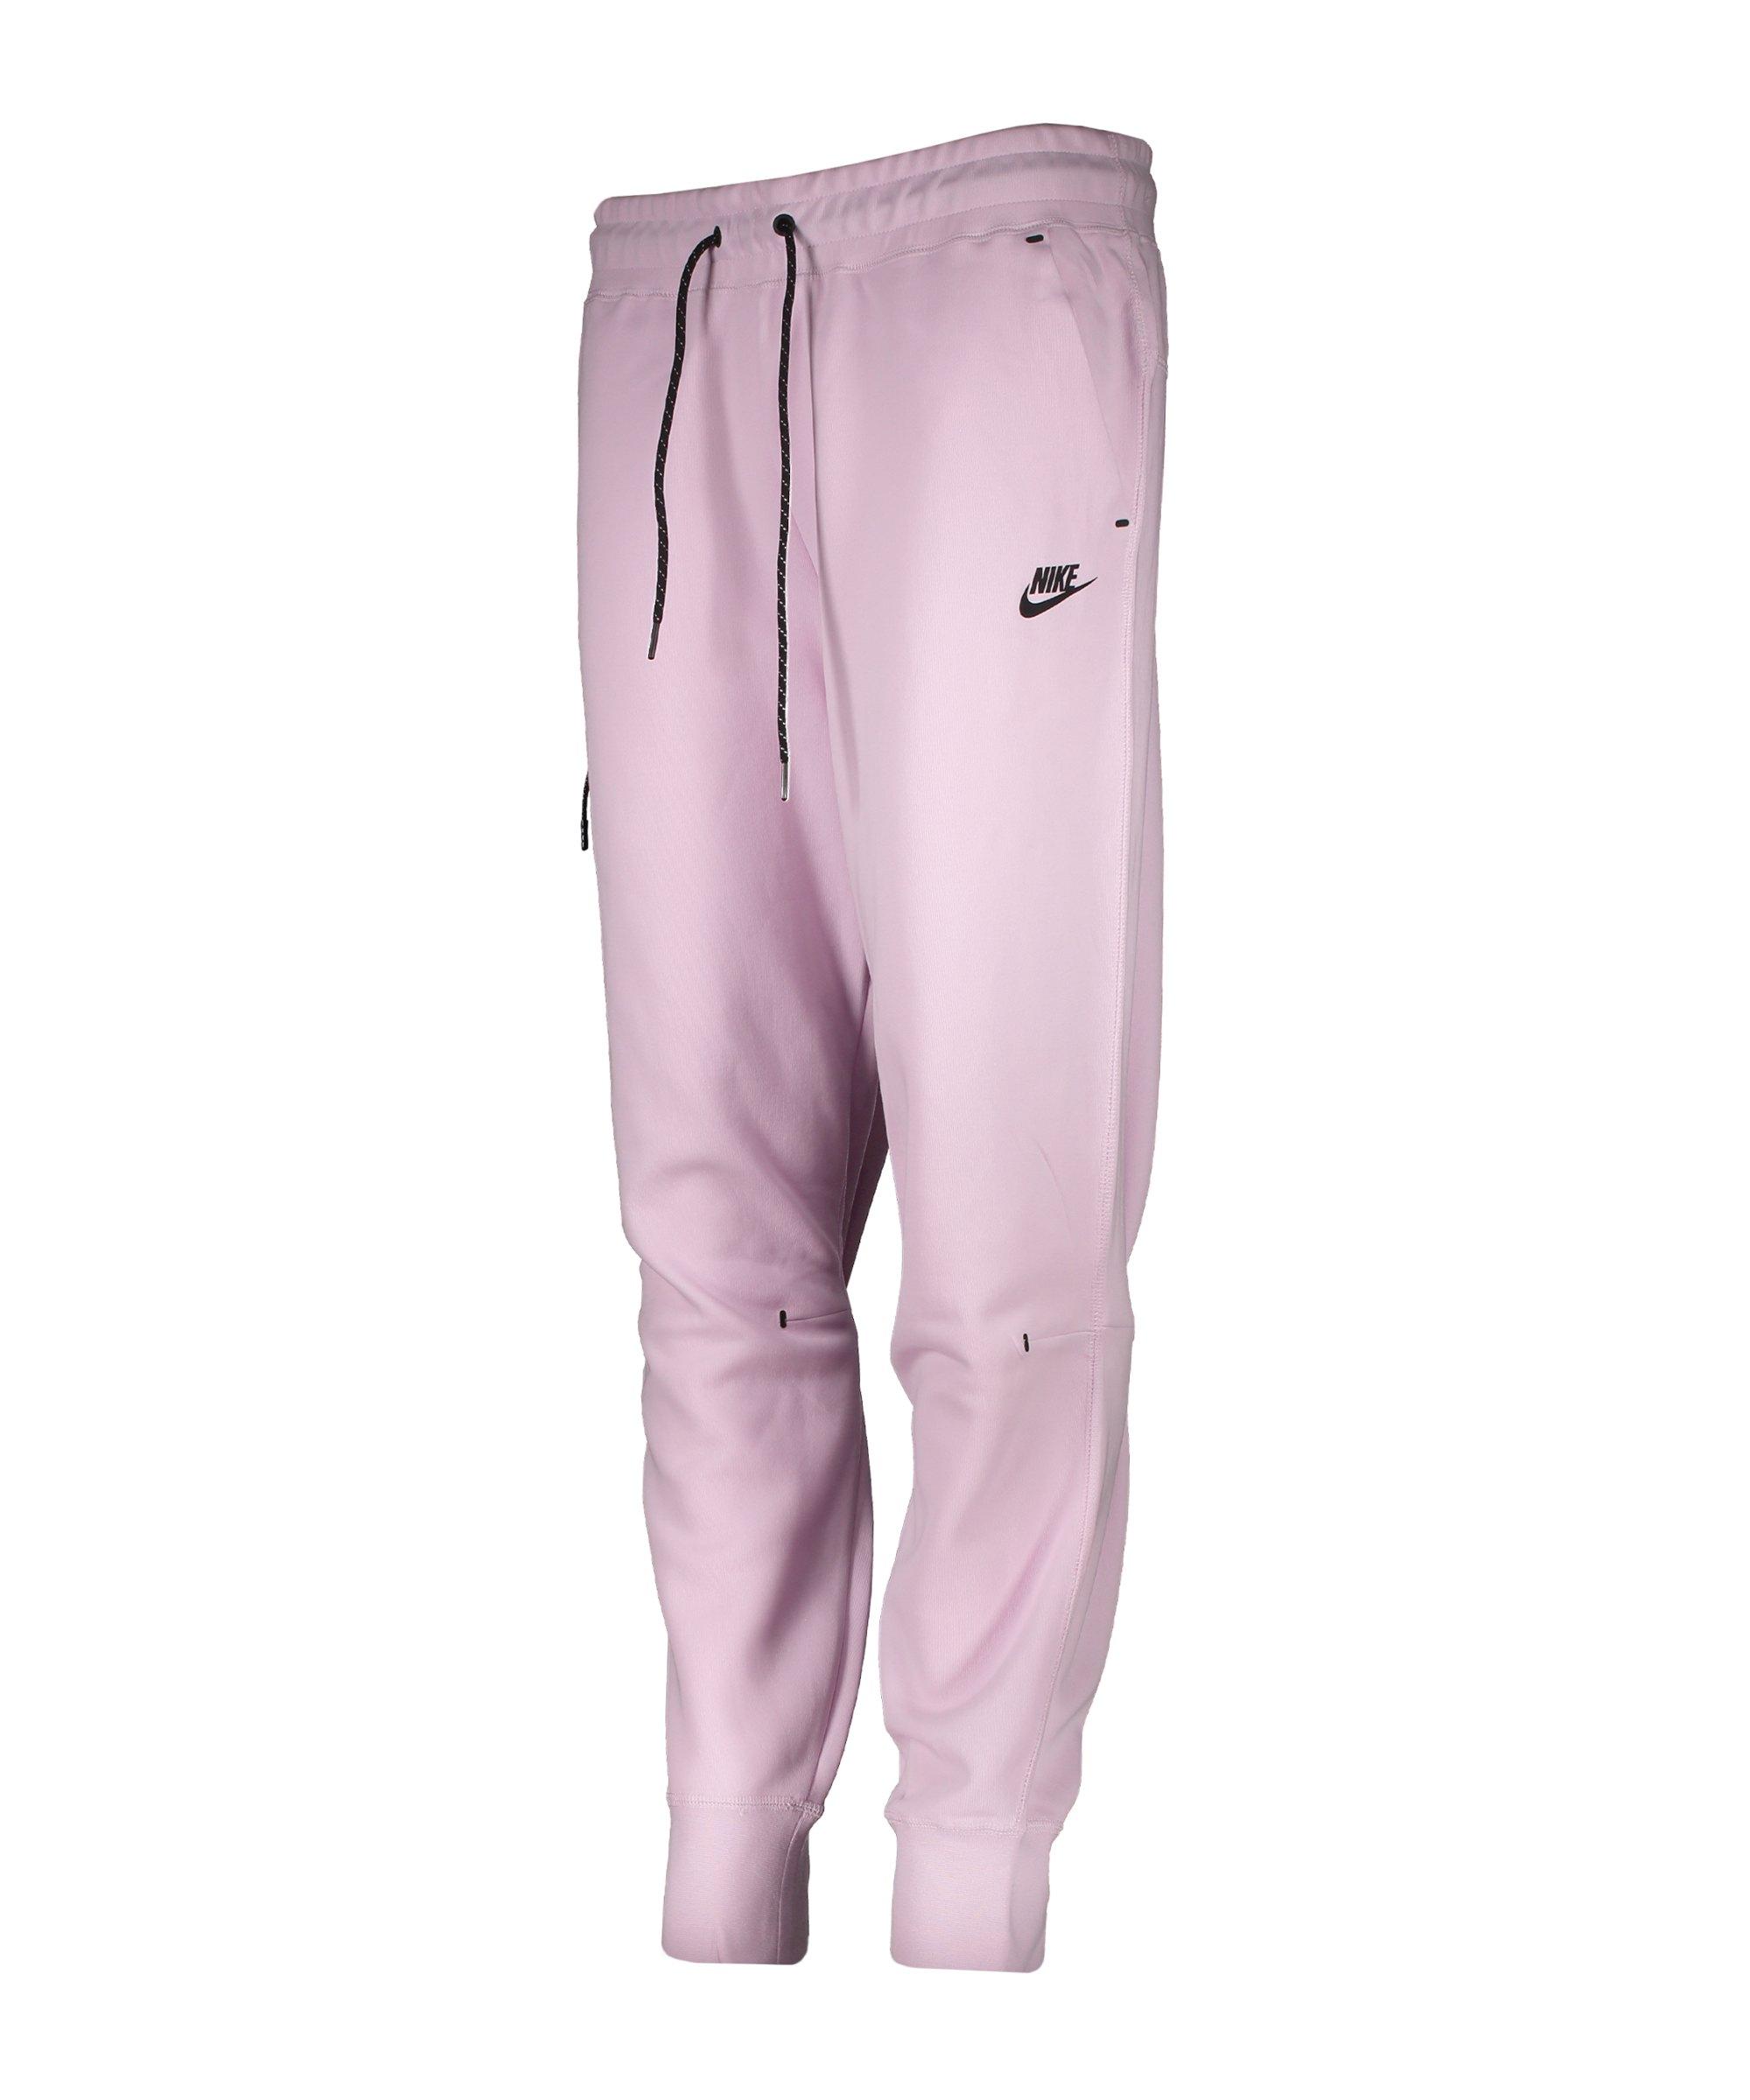 Nike Tech Fleece Jogginghose Damen Pink F695 - pink